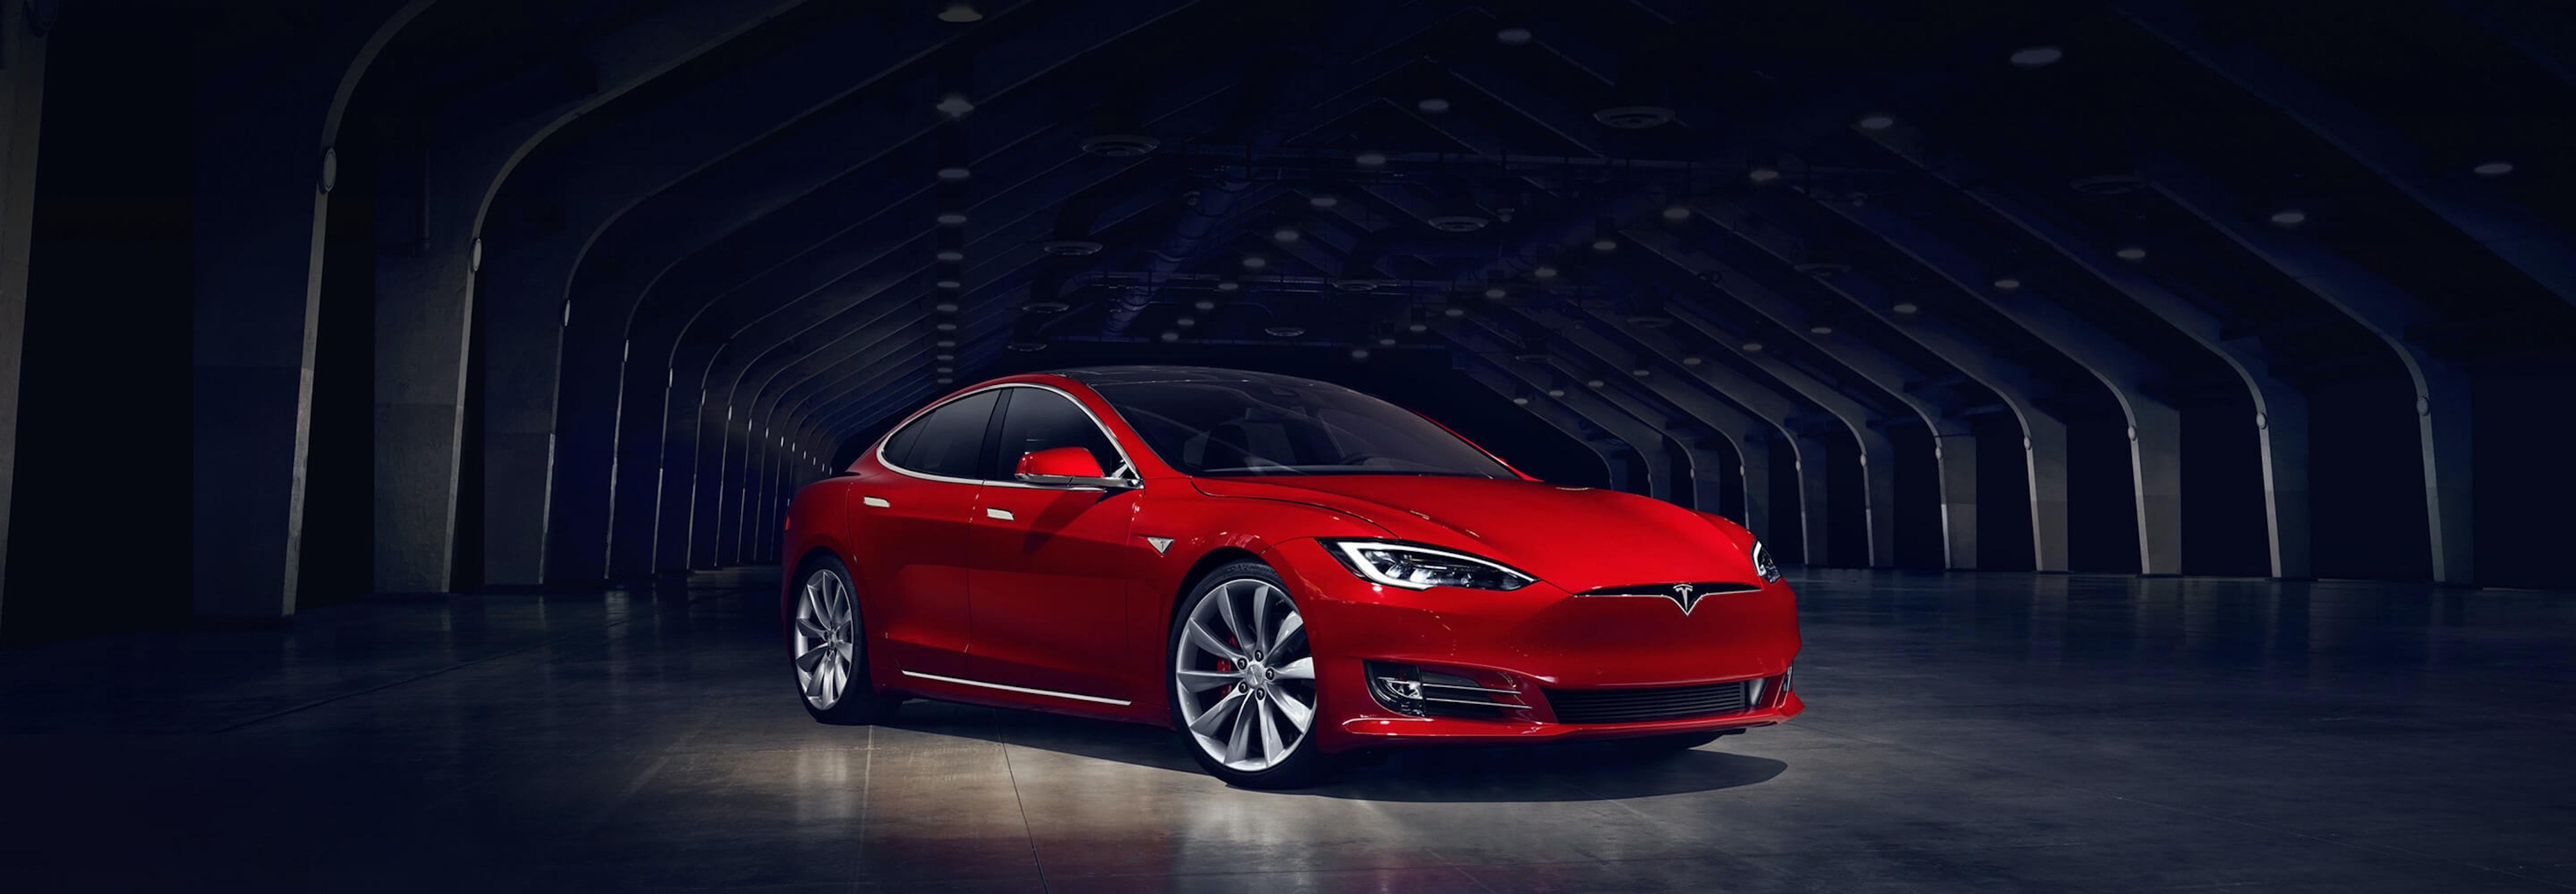 The Tesla Model S.